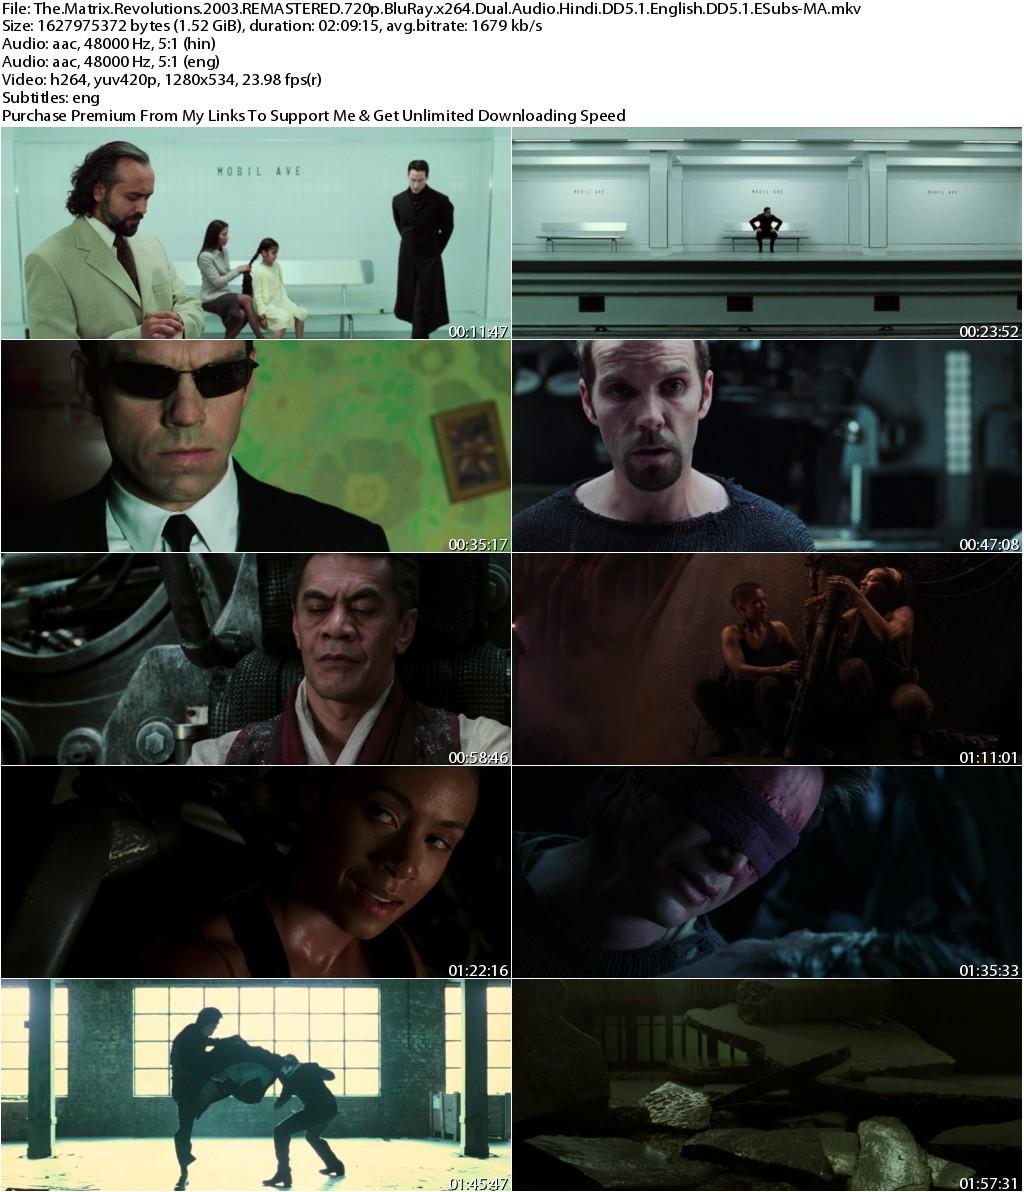 The Matrix Revolutions (2003) REMASTERED 720p BluRay x264 Dual Audio Hindi DD5.1 English DD5.1 ESubs-MA